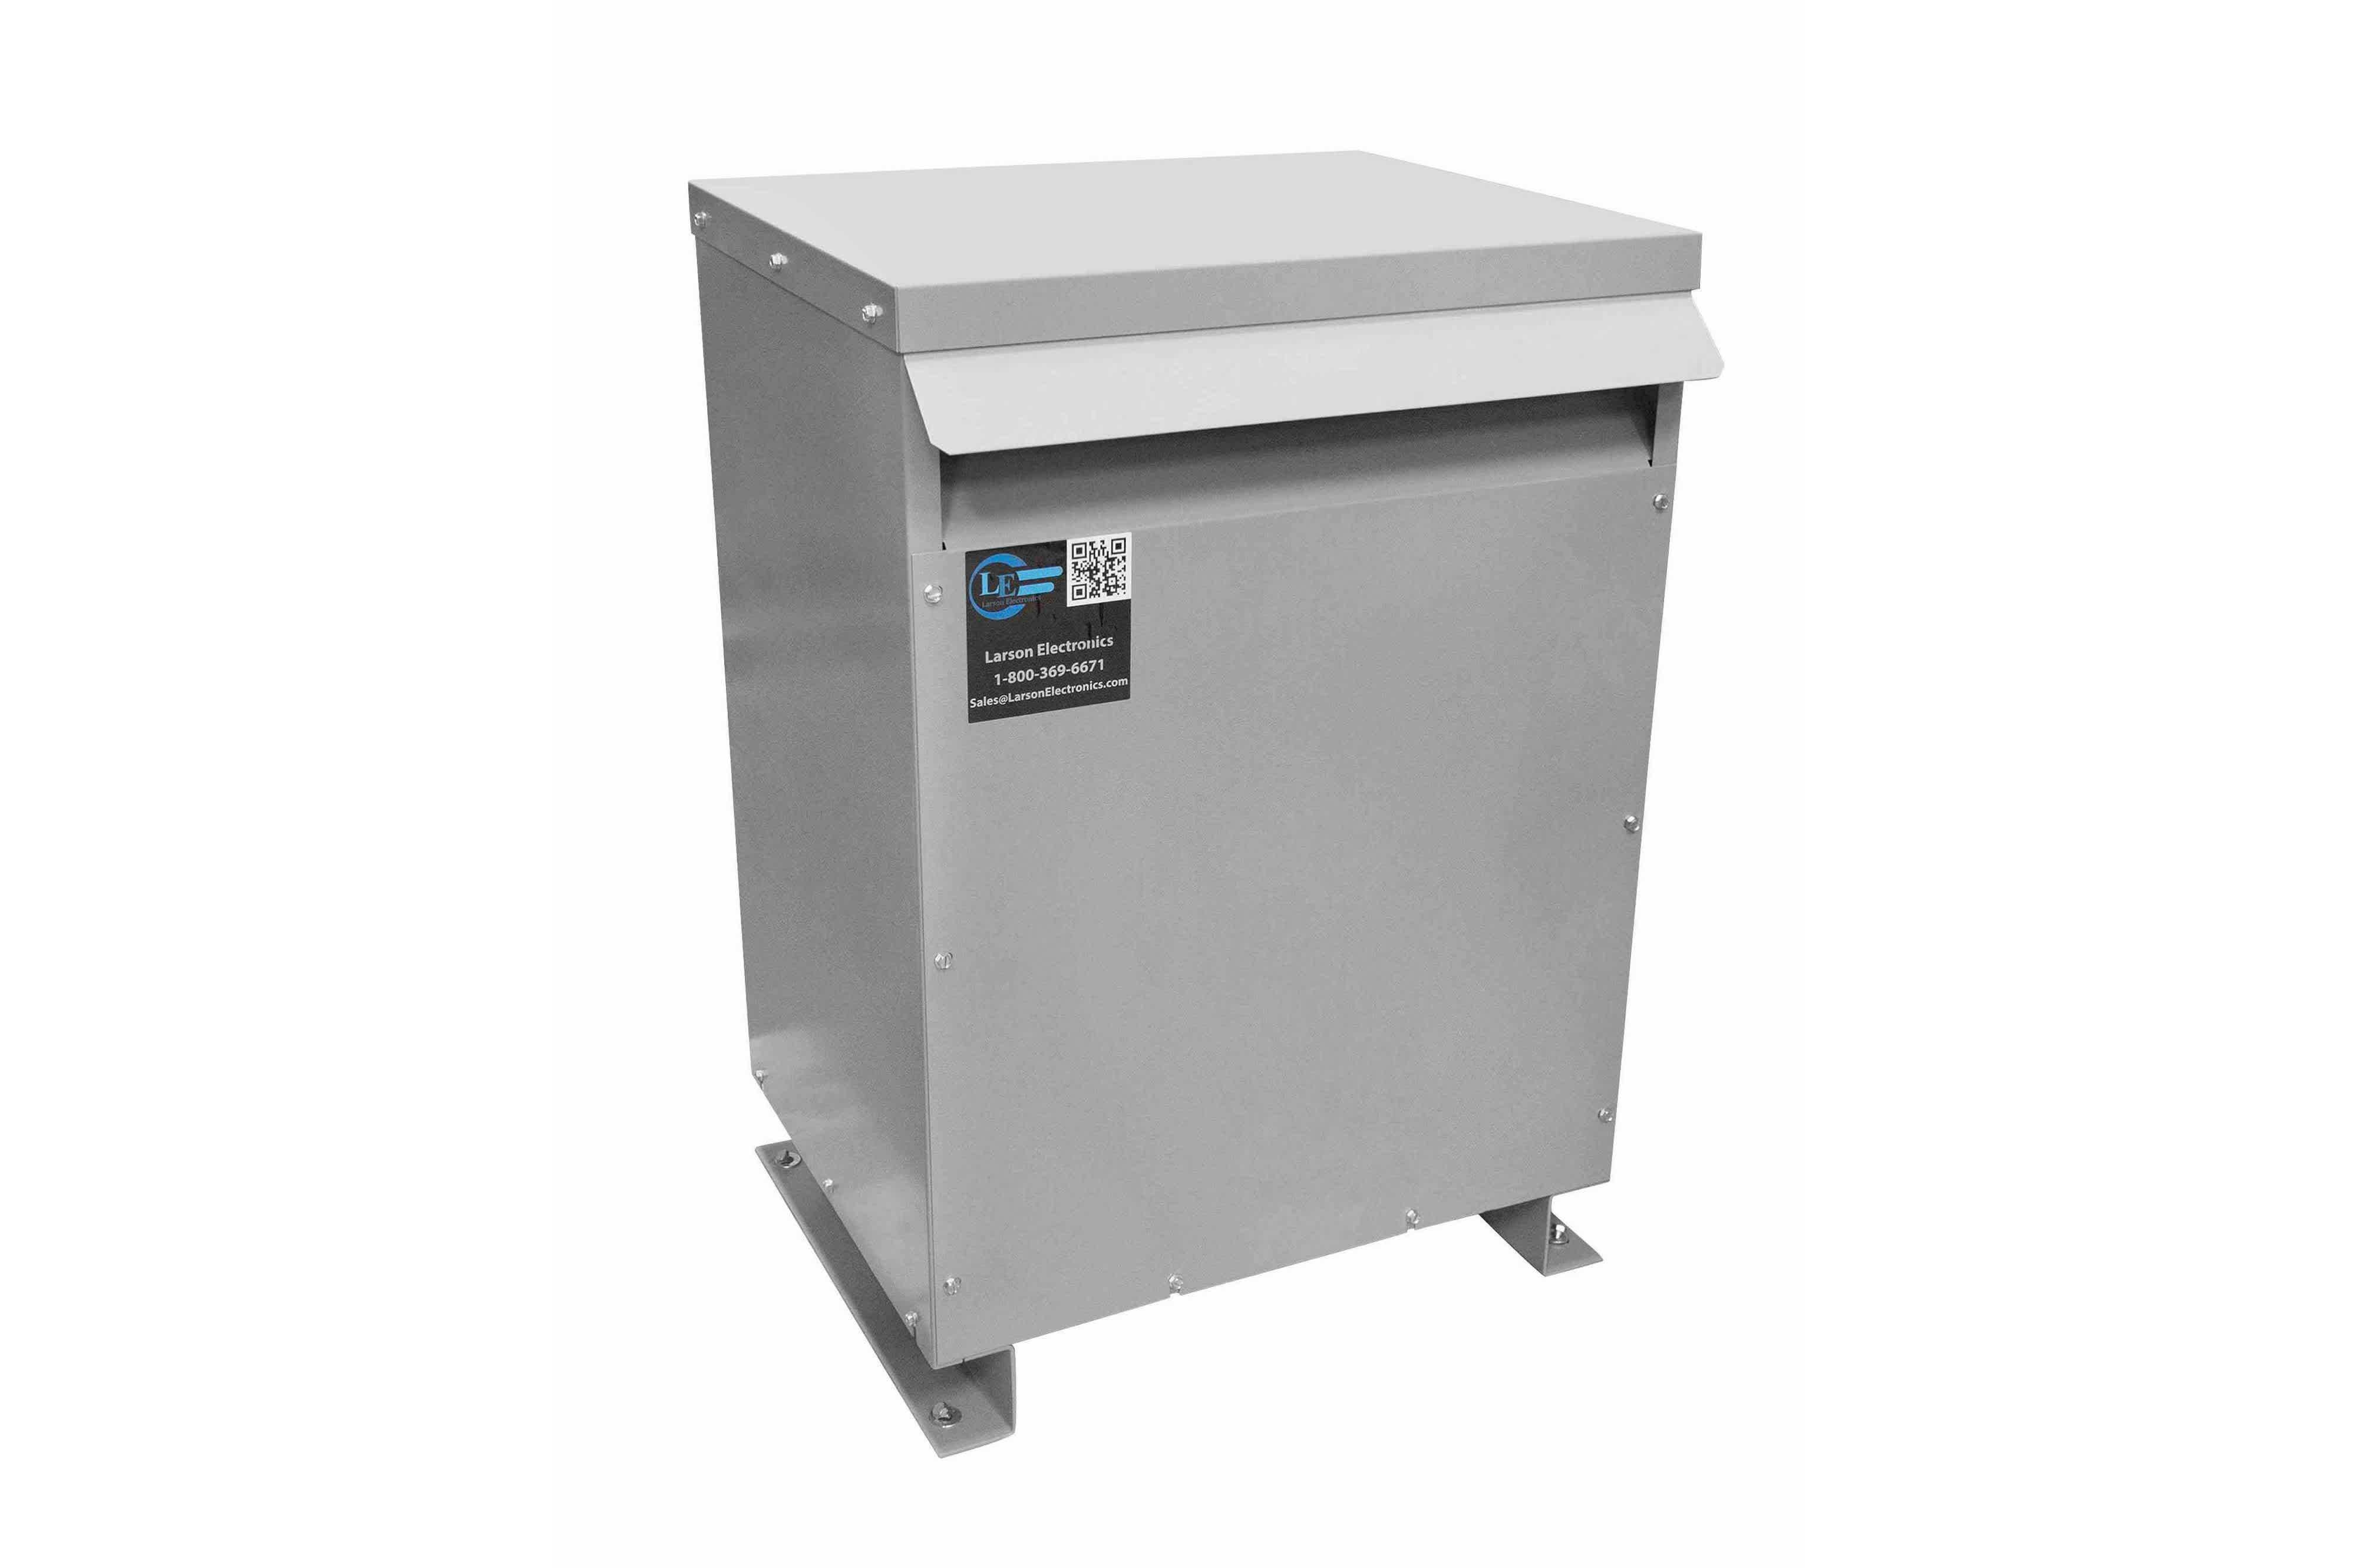 30 kVA 3PH Isolation Transformer, 575V Wye Primary, 480Y/277 Wye-N Secondary, N3R, Ventilated, 60 Hz